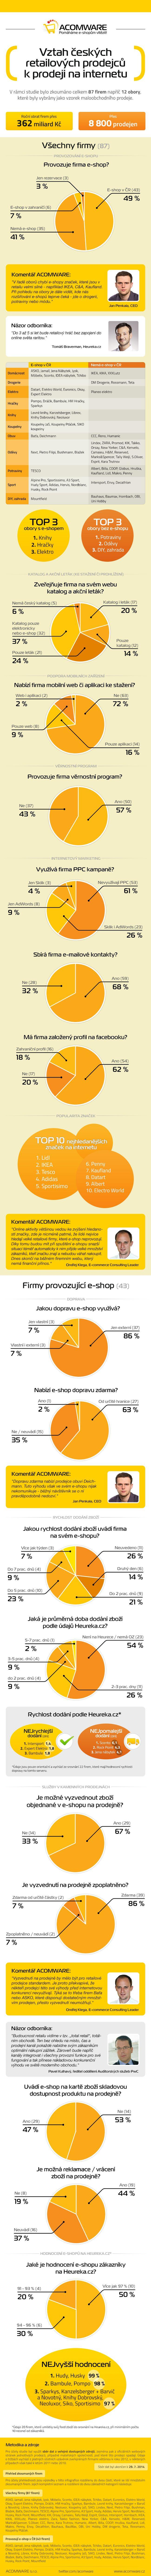 Retail-studie_2014_ACOMWARE_650px